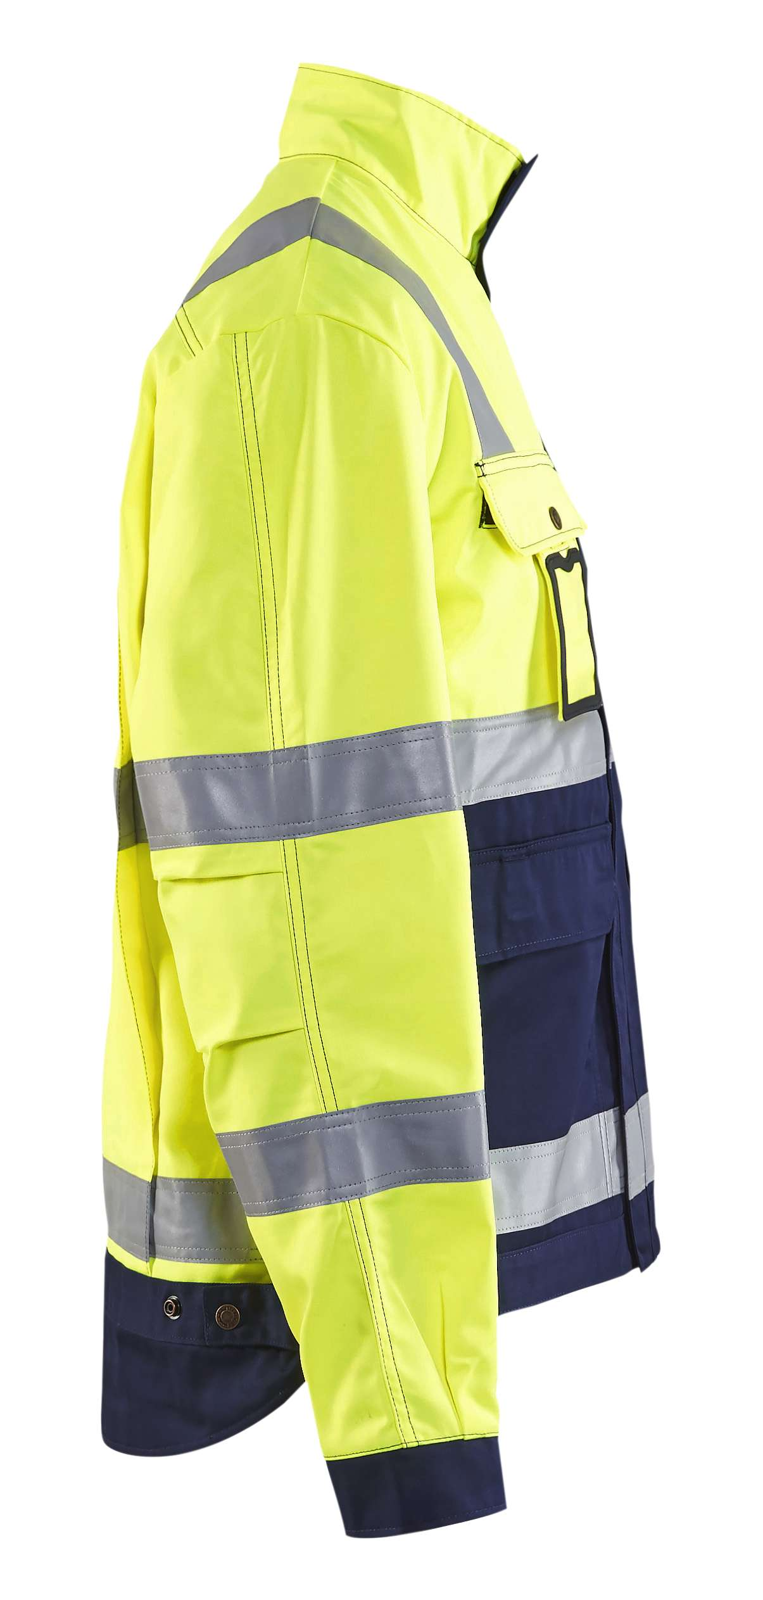 Blaklader Combi-jacks 40231804 High Vis geel-marineblauw(3389)